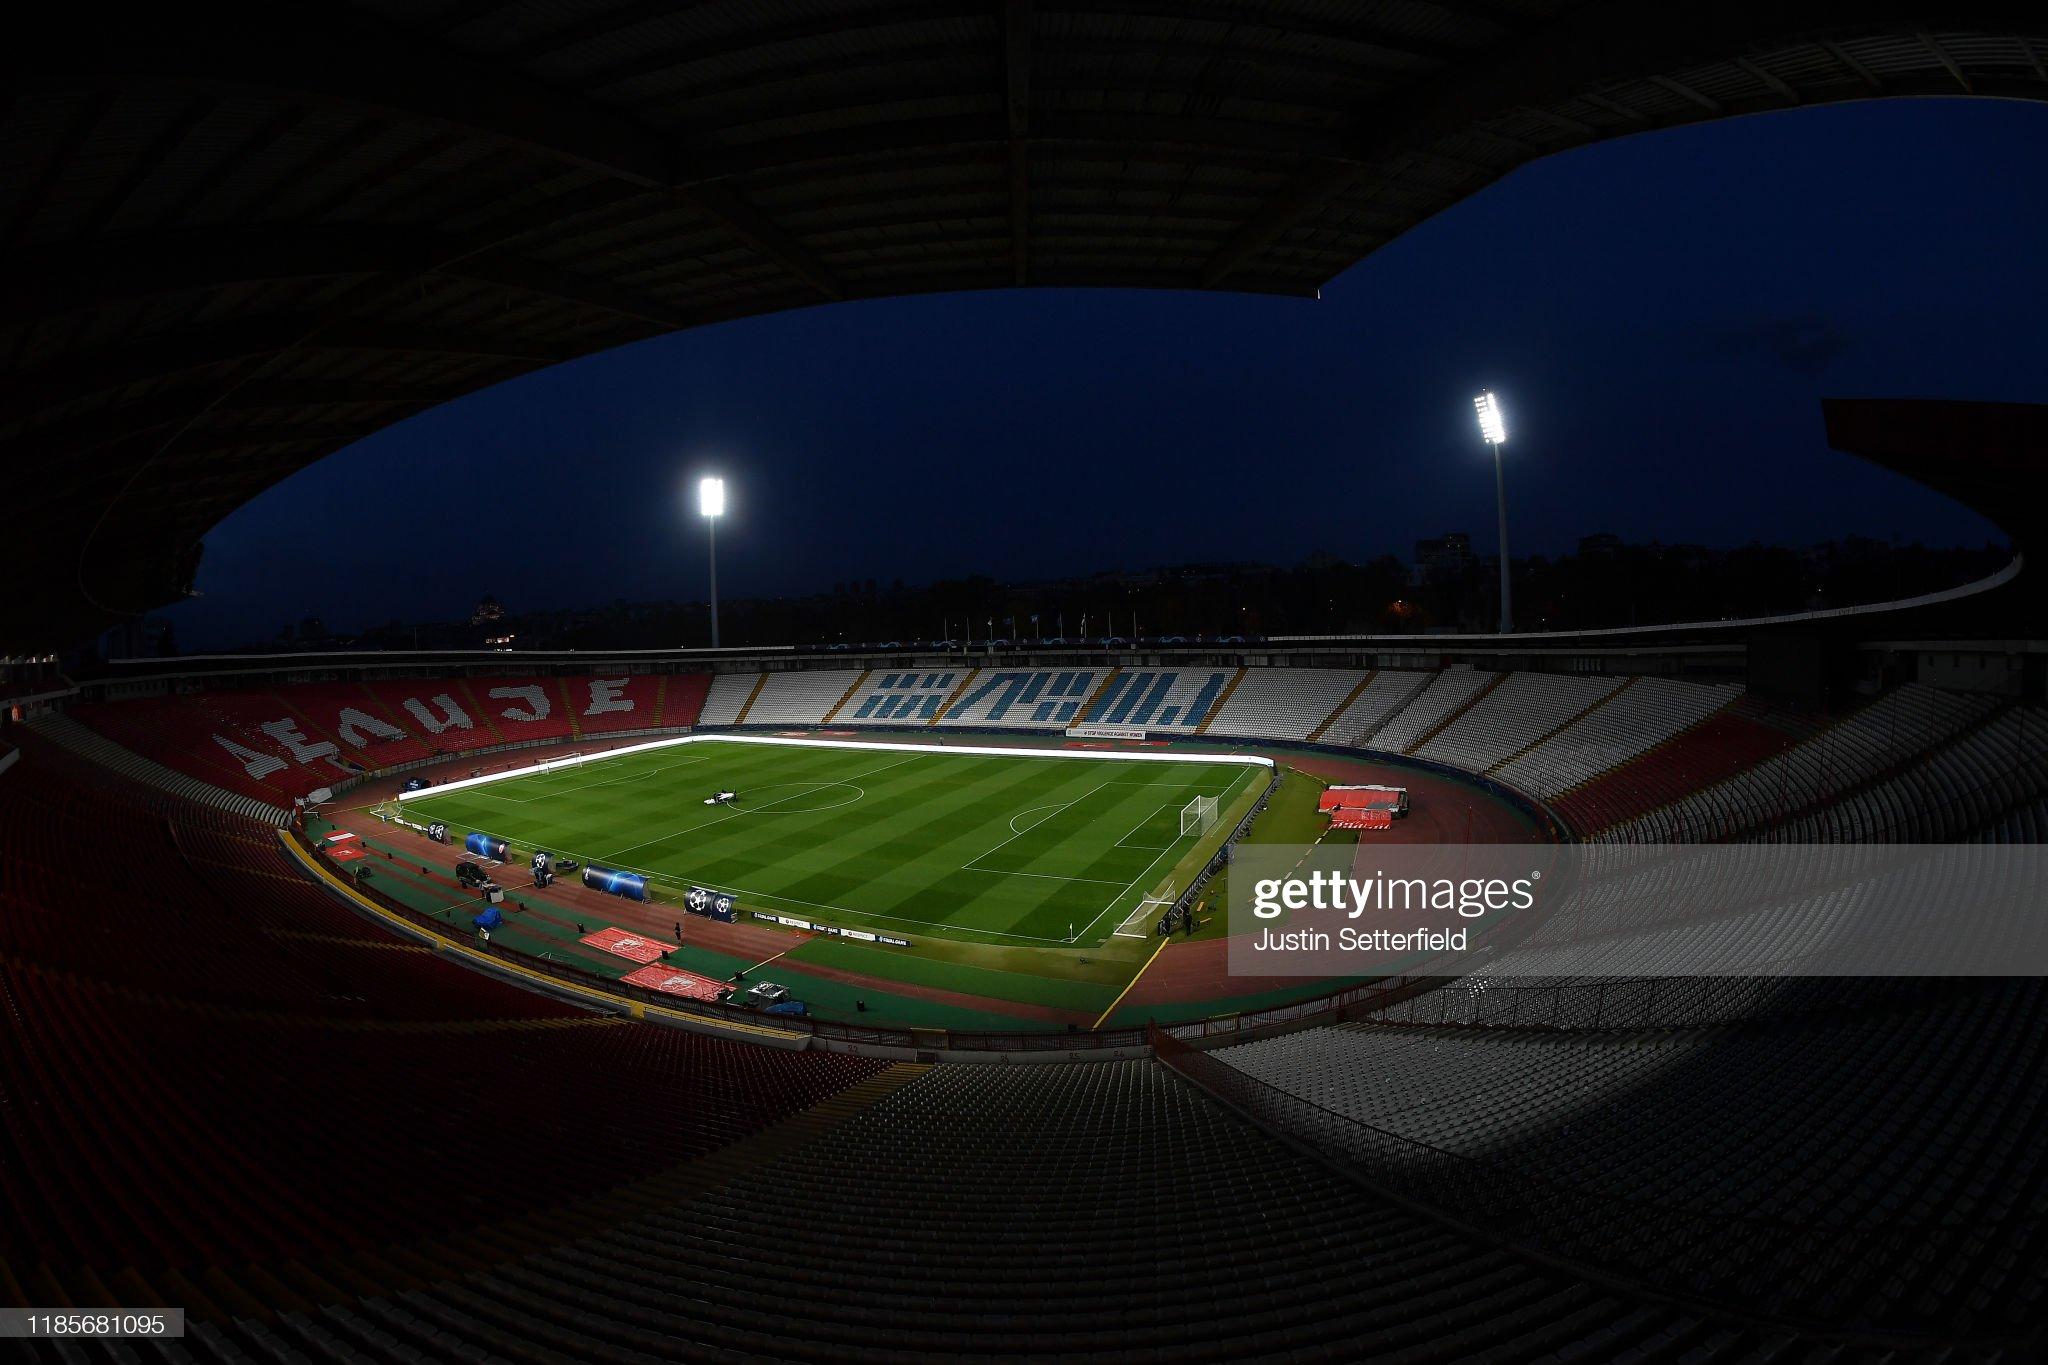 Serbia vs Scotland Preview, prediction and odds